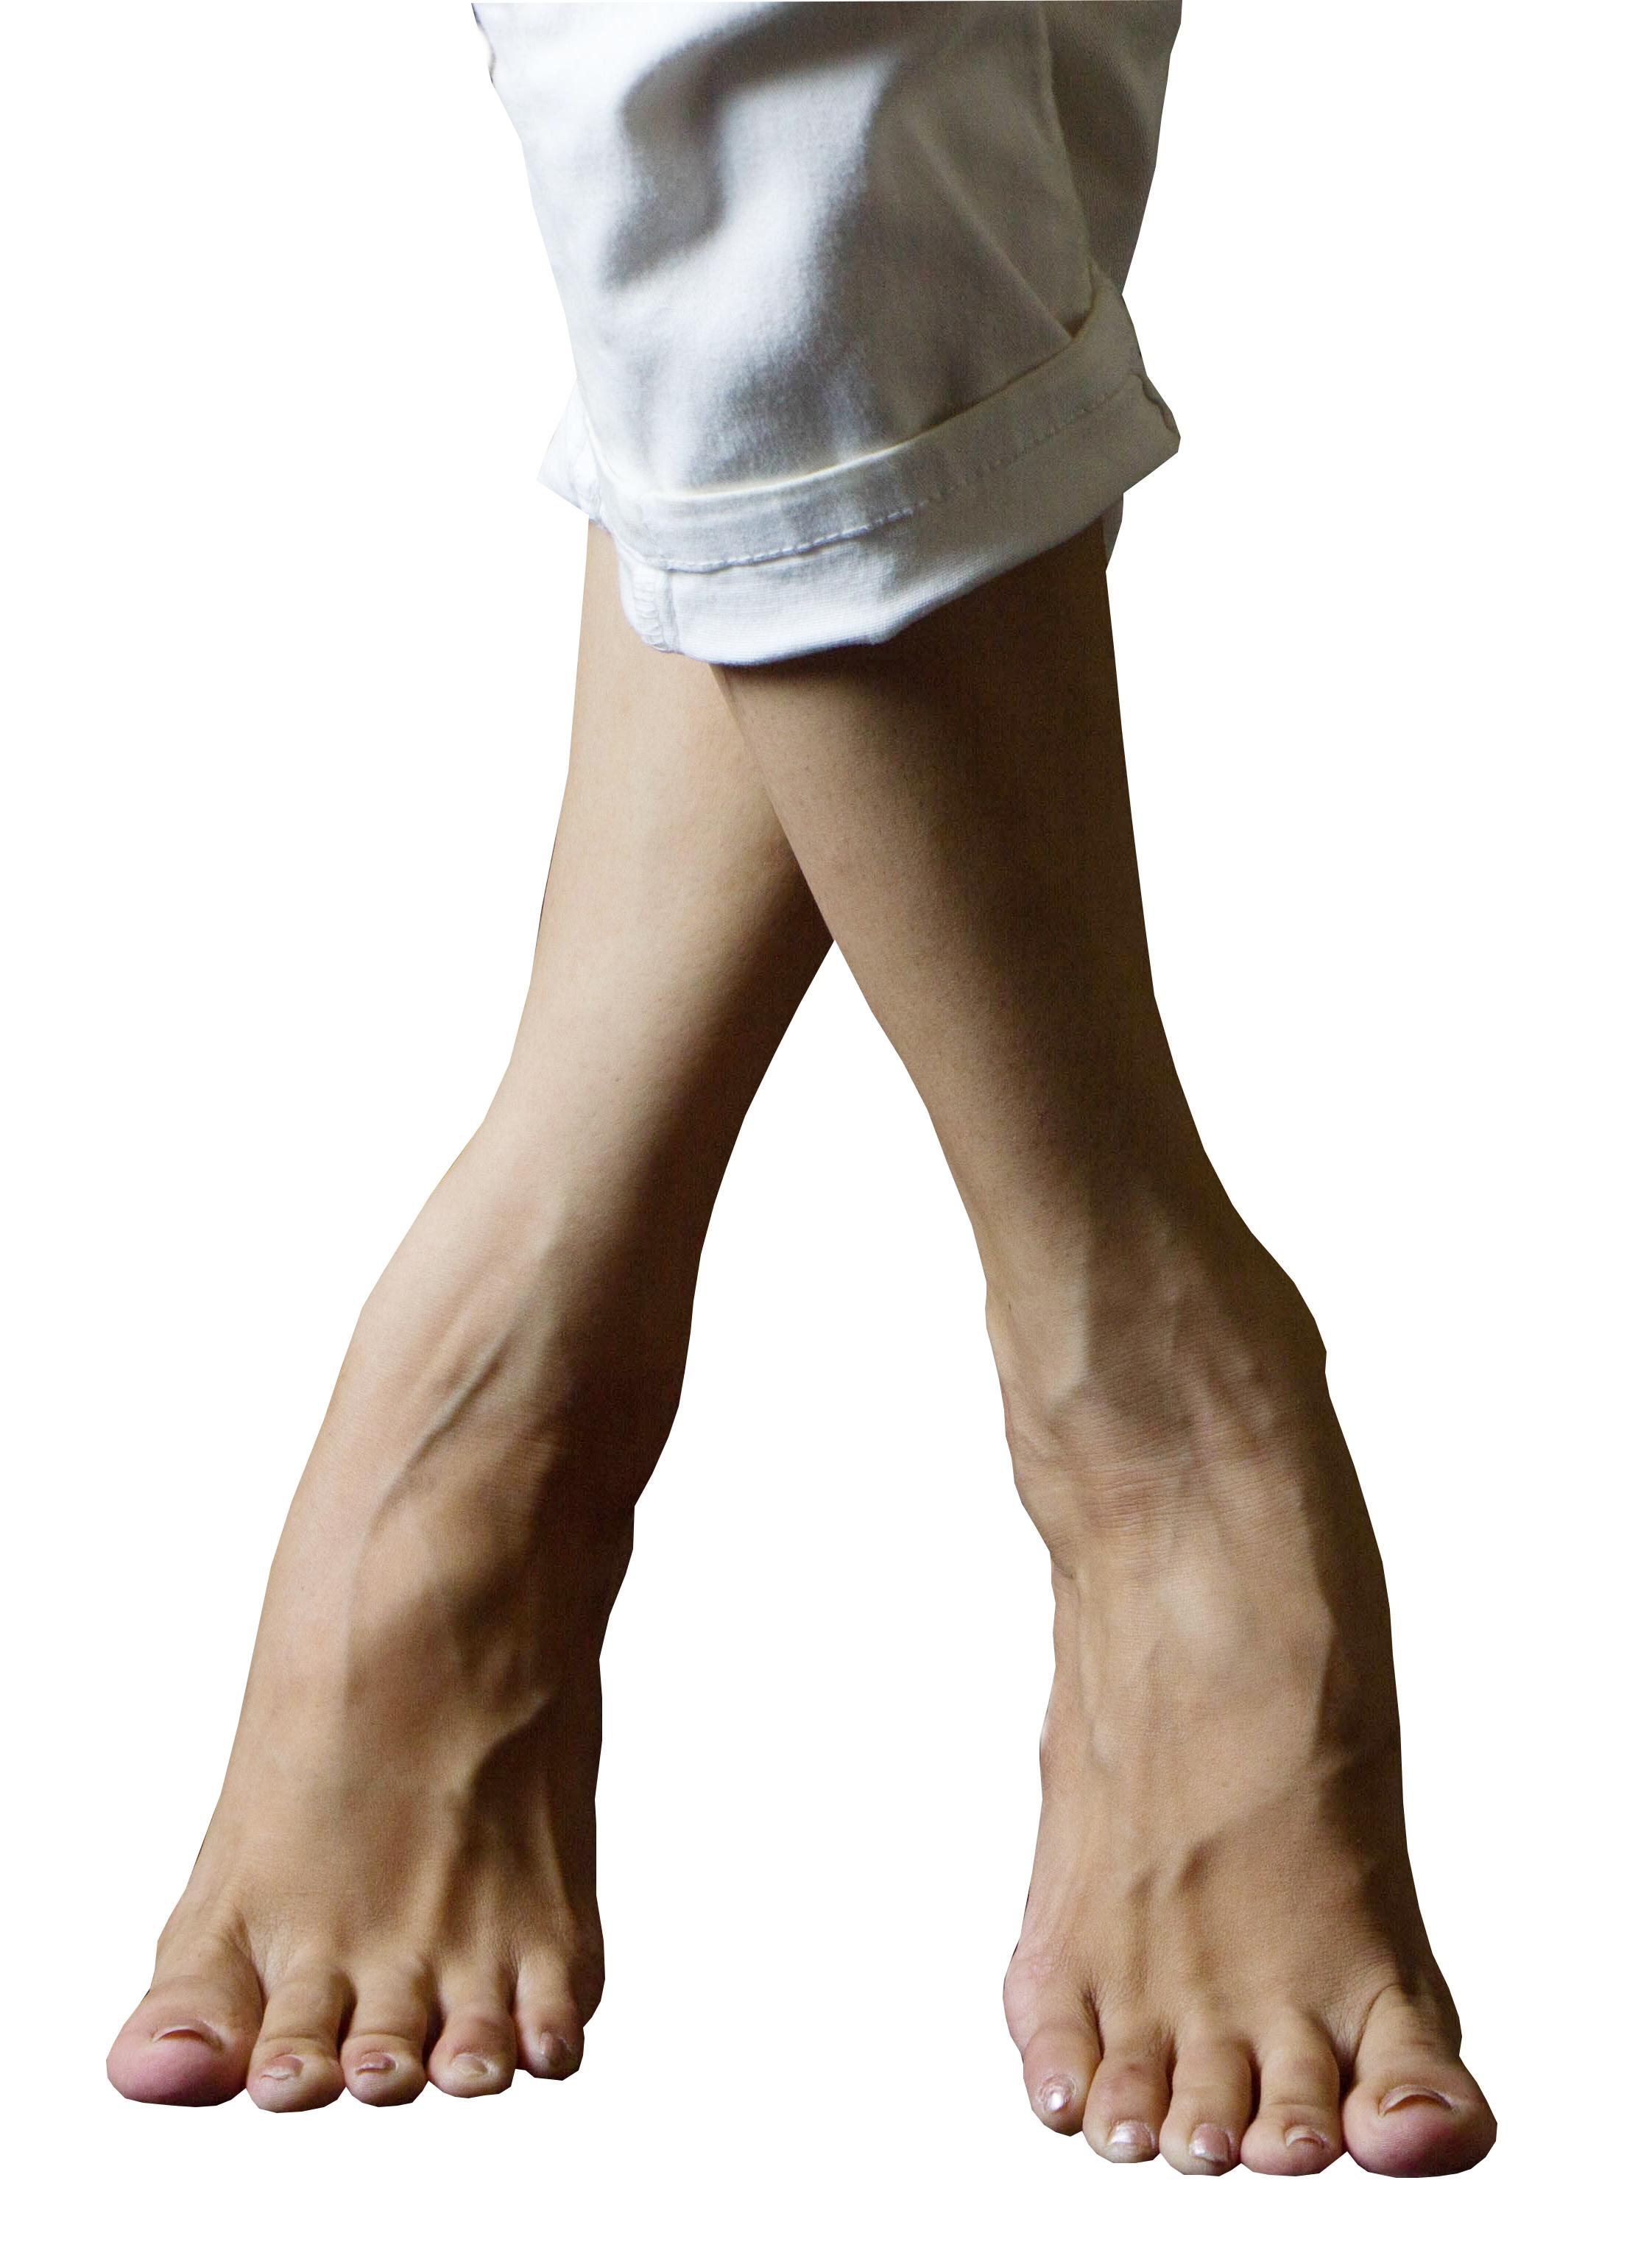 Fußcheck